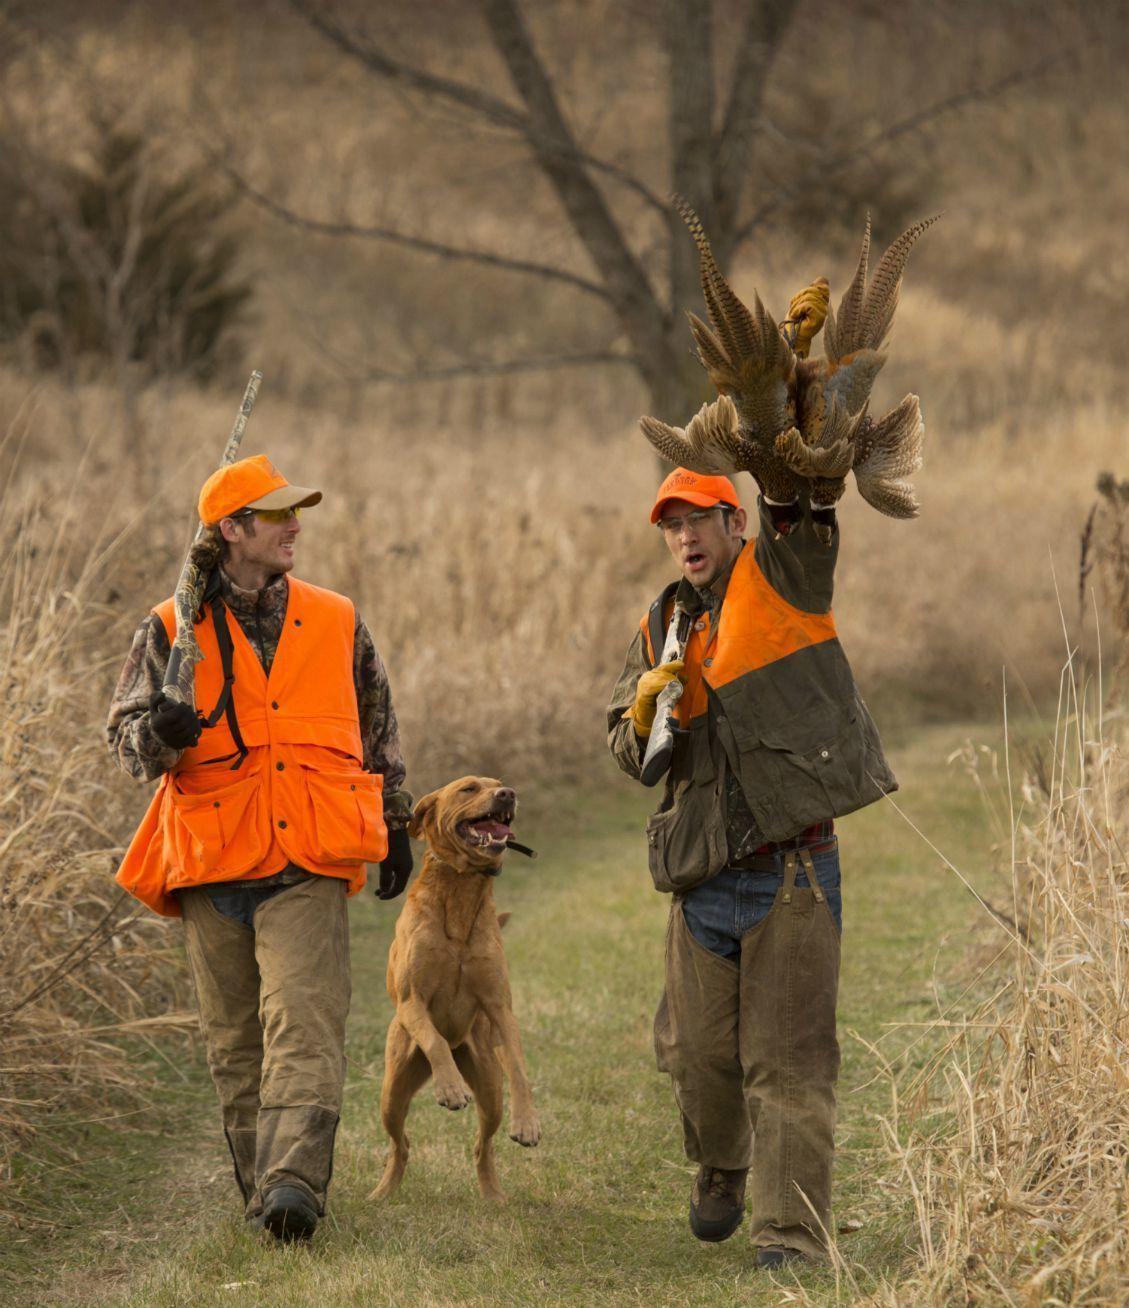 Outfitting Upland Bird Hunters